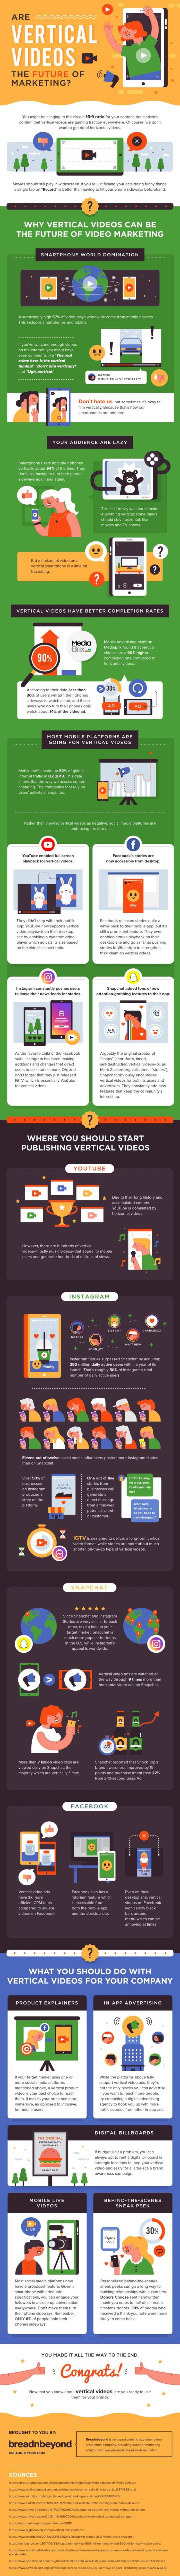 vertical videos social media marketing infographic